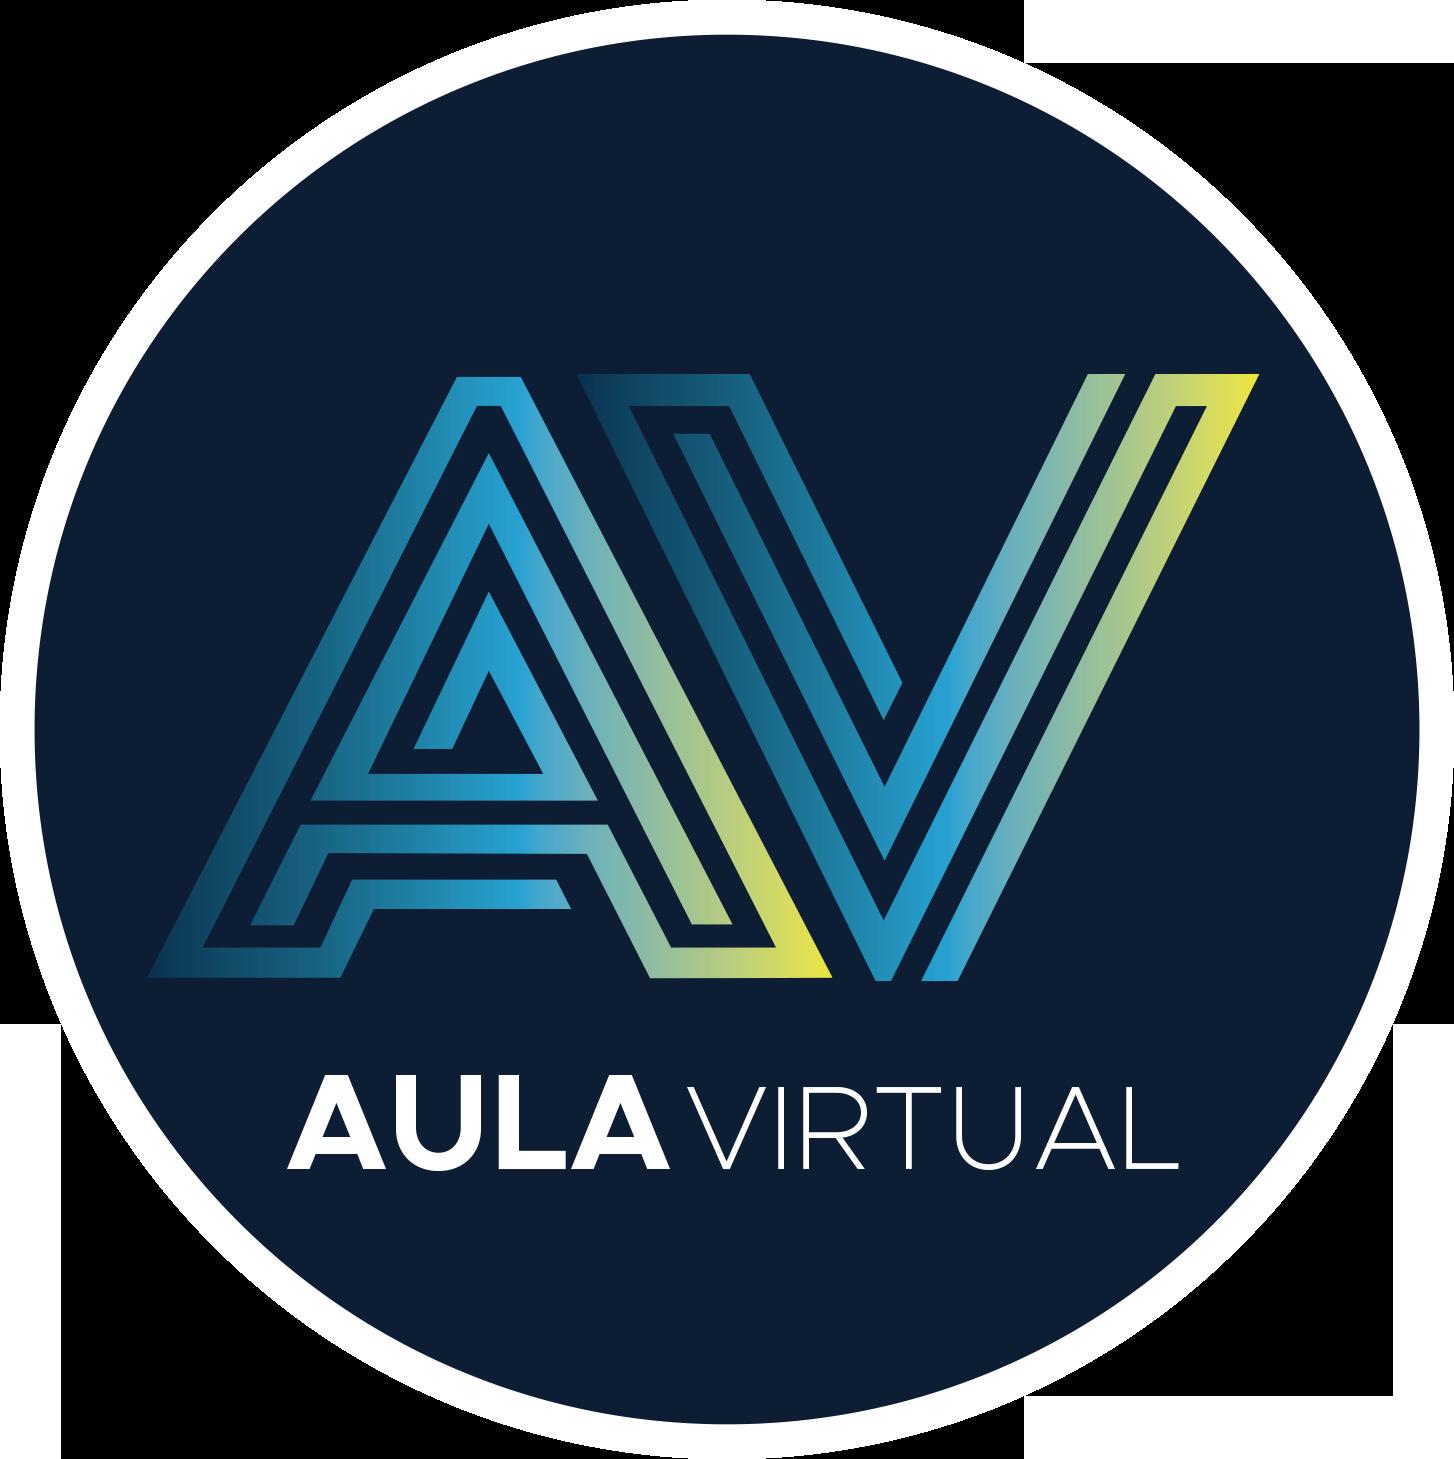 Aula Virtual Rauda Global